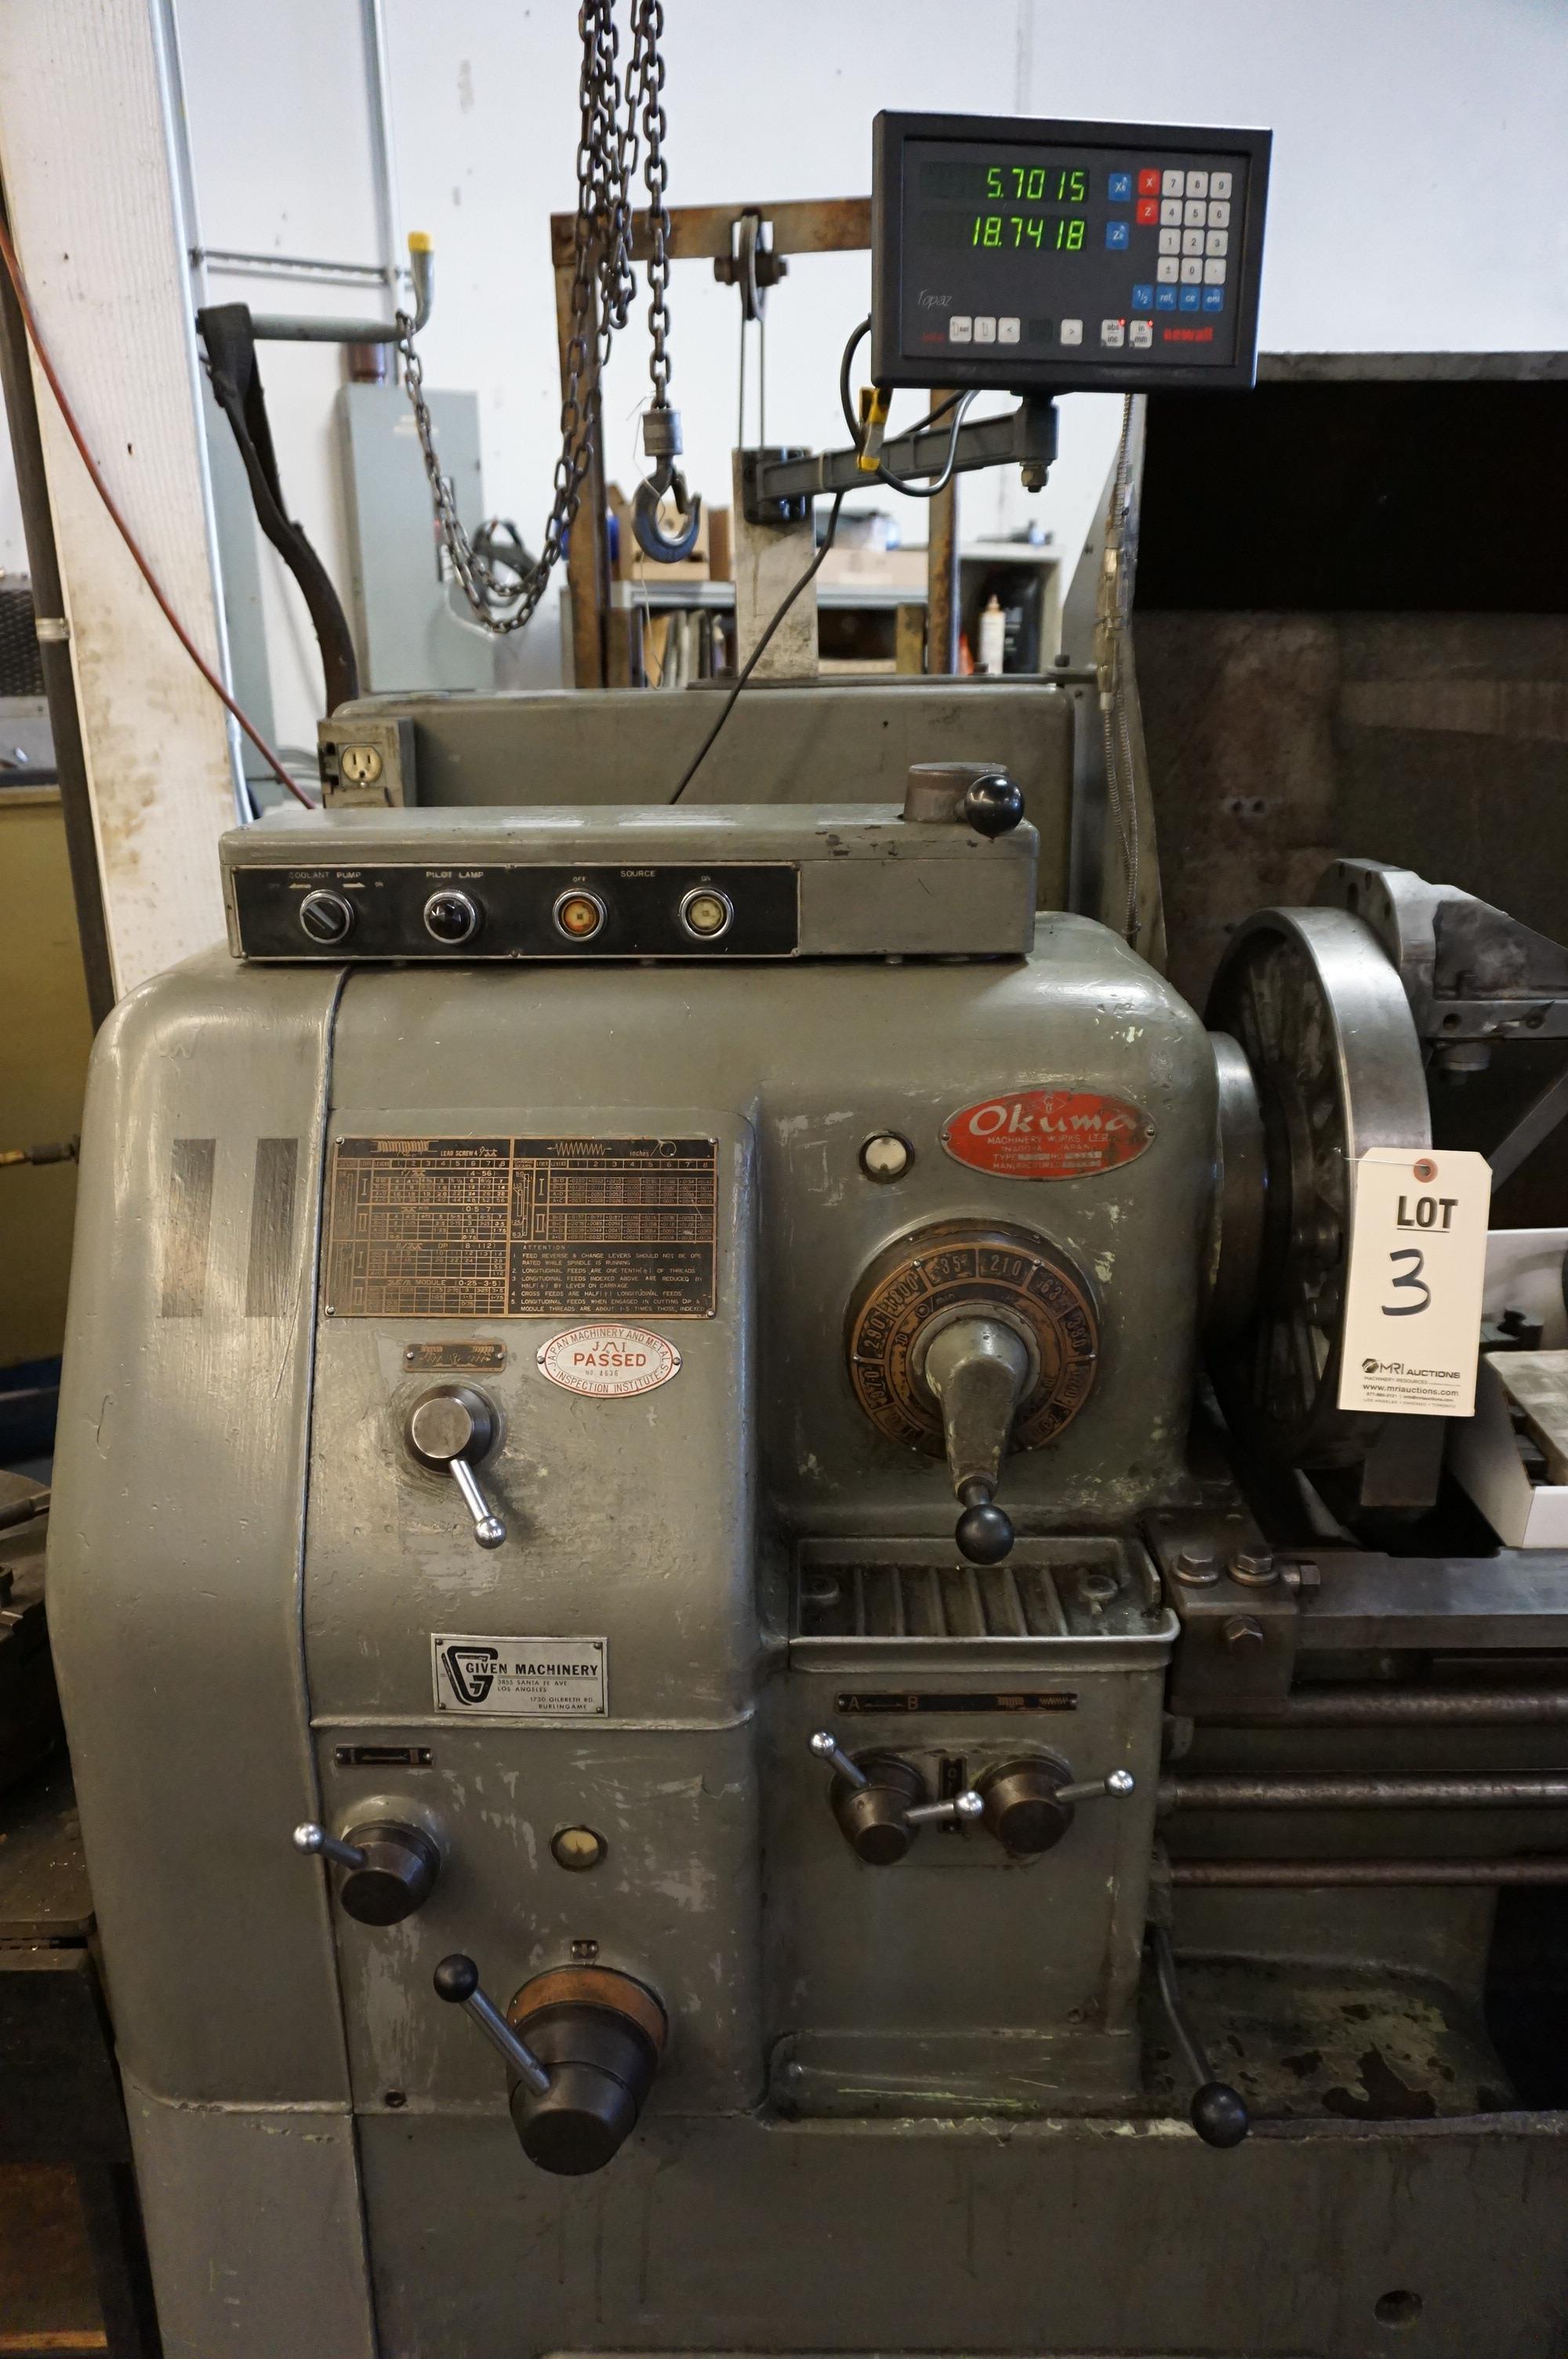 "1965 OKUMA LS 16"" x 47"" SWING, S/N 8656, NEWALL TOPAZ DRO, SKY HOOK 500 LB CRANE, 1 TON CRANE, - Image 3 of 11"